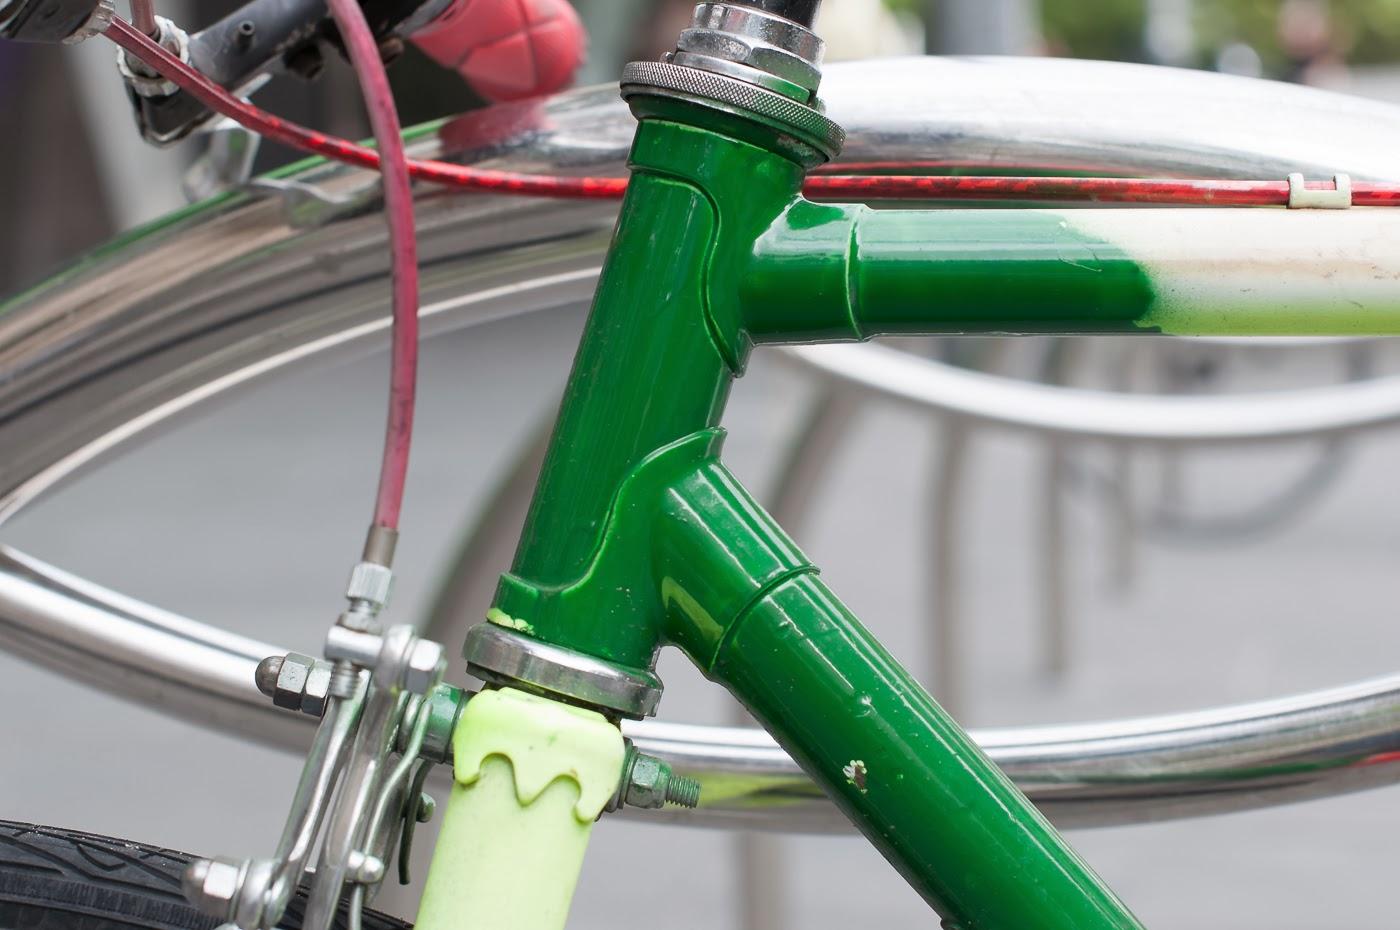 Pub bike, bike, bicycle, conversion, road bike, tim macauley, the biketorialist, Melbourne, Australia, swanston st, head tube, lugging, lugs, lug,